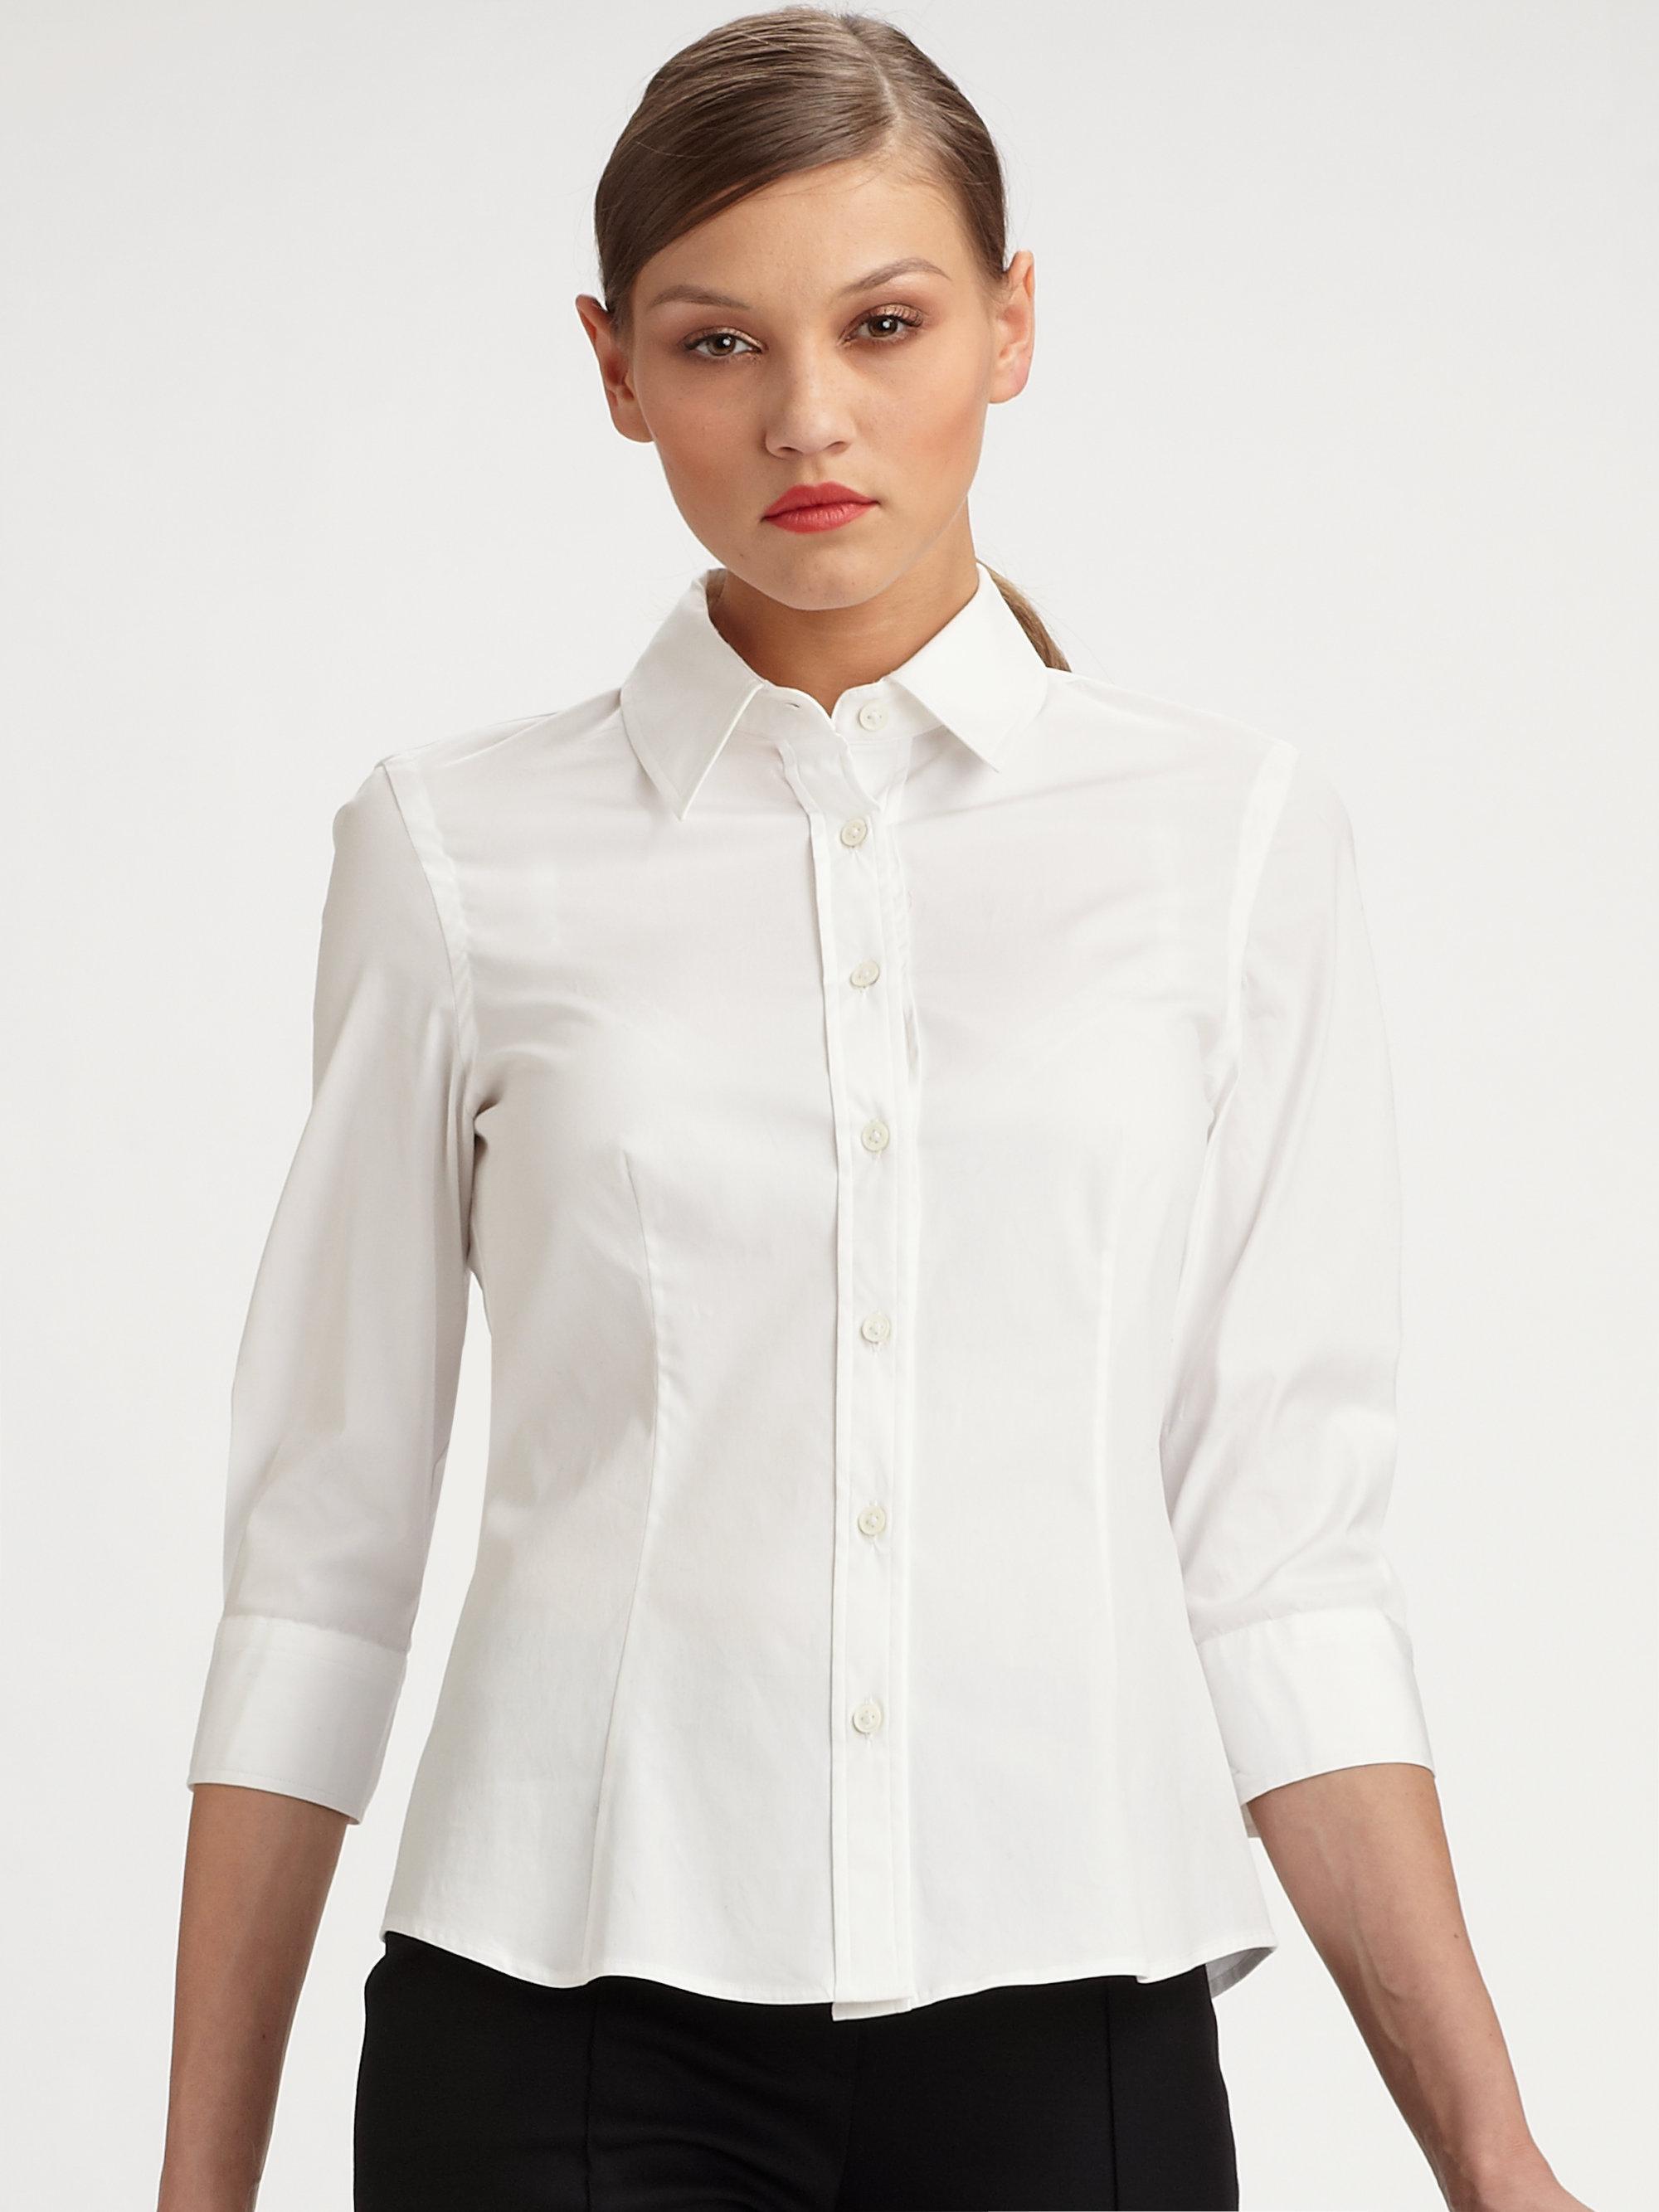 Lyst Carolina Herrera Stretch Cotton Poplin Shirt In White